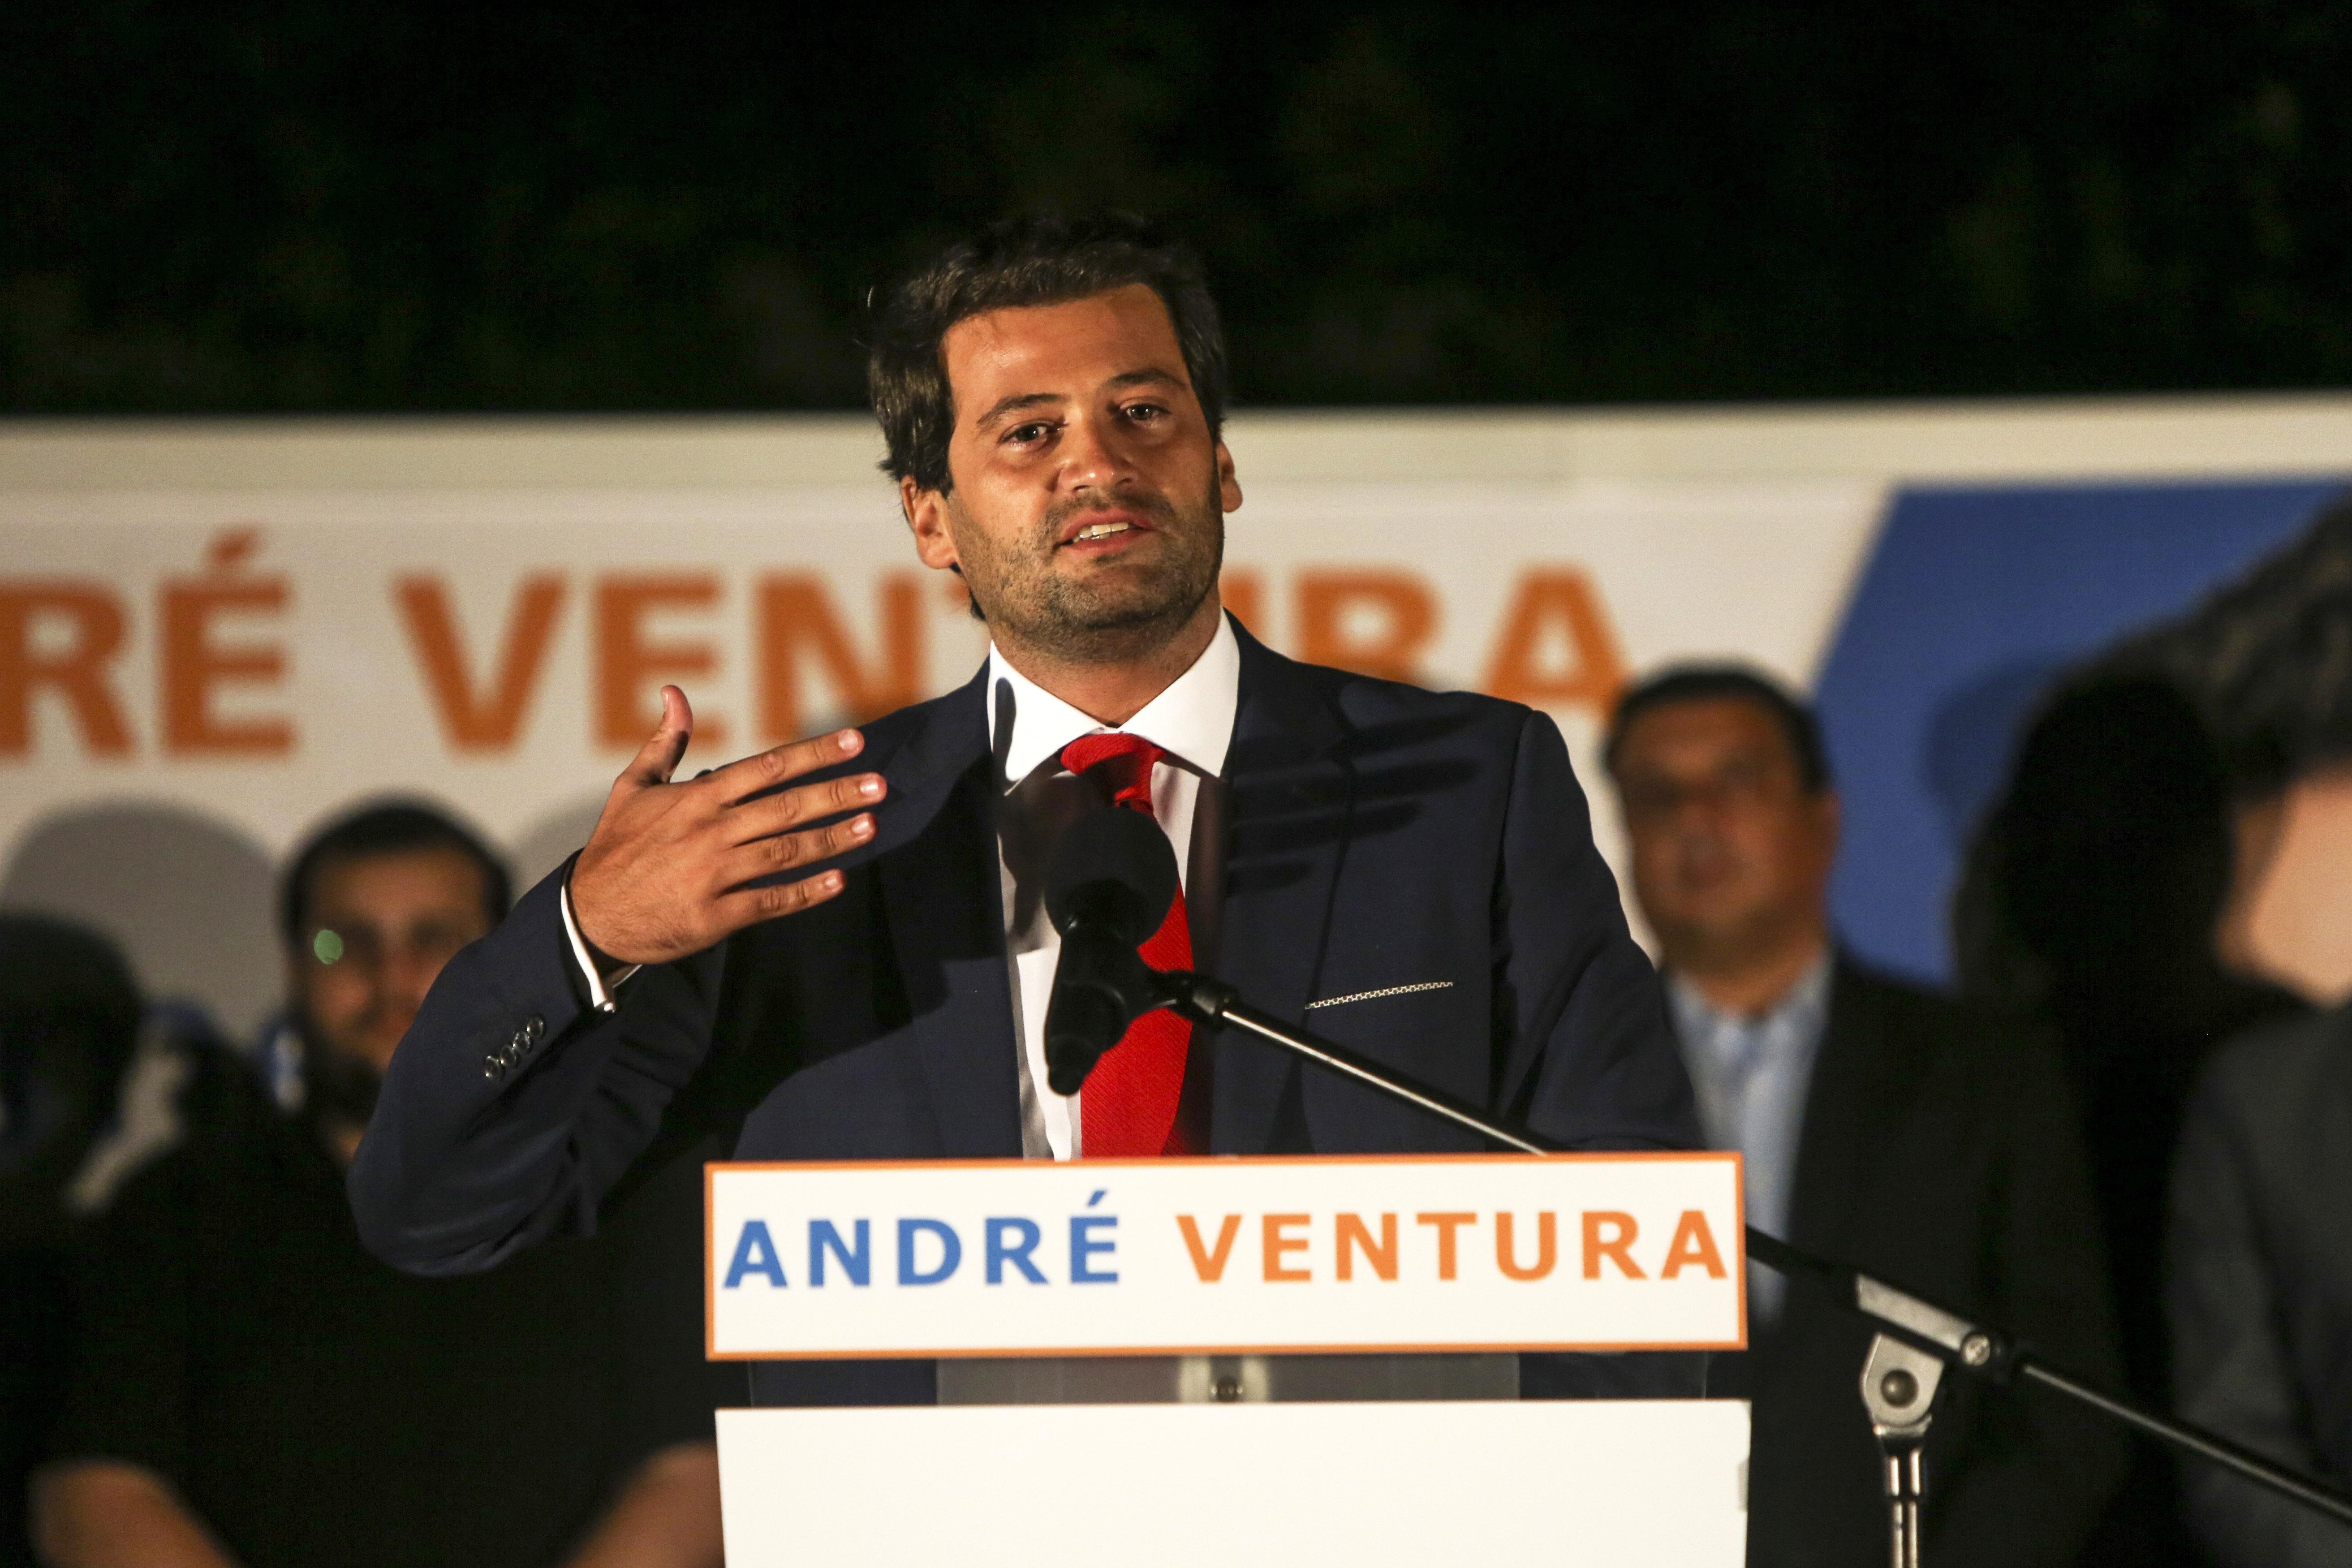 Caso André Ventura: candidato defende-se